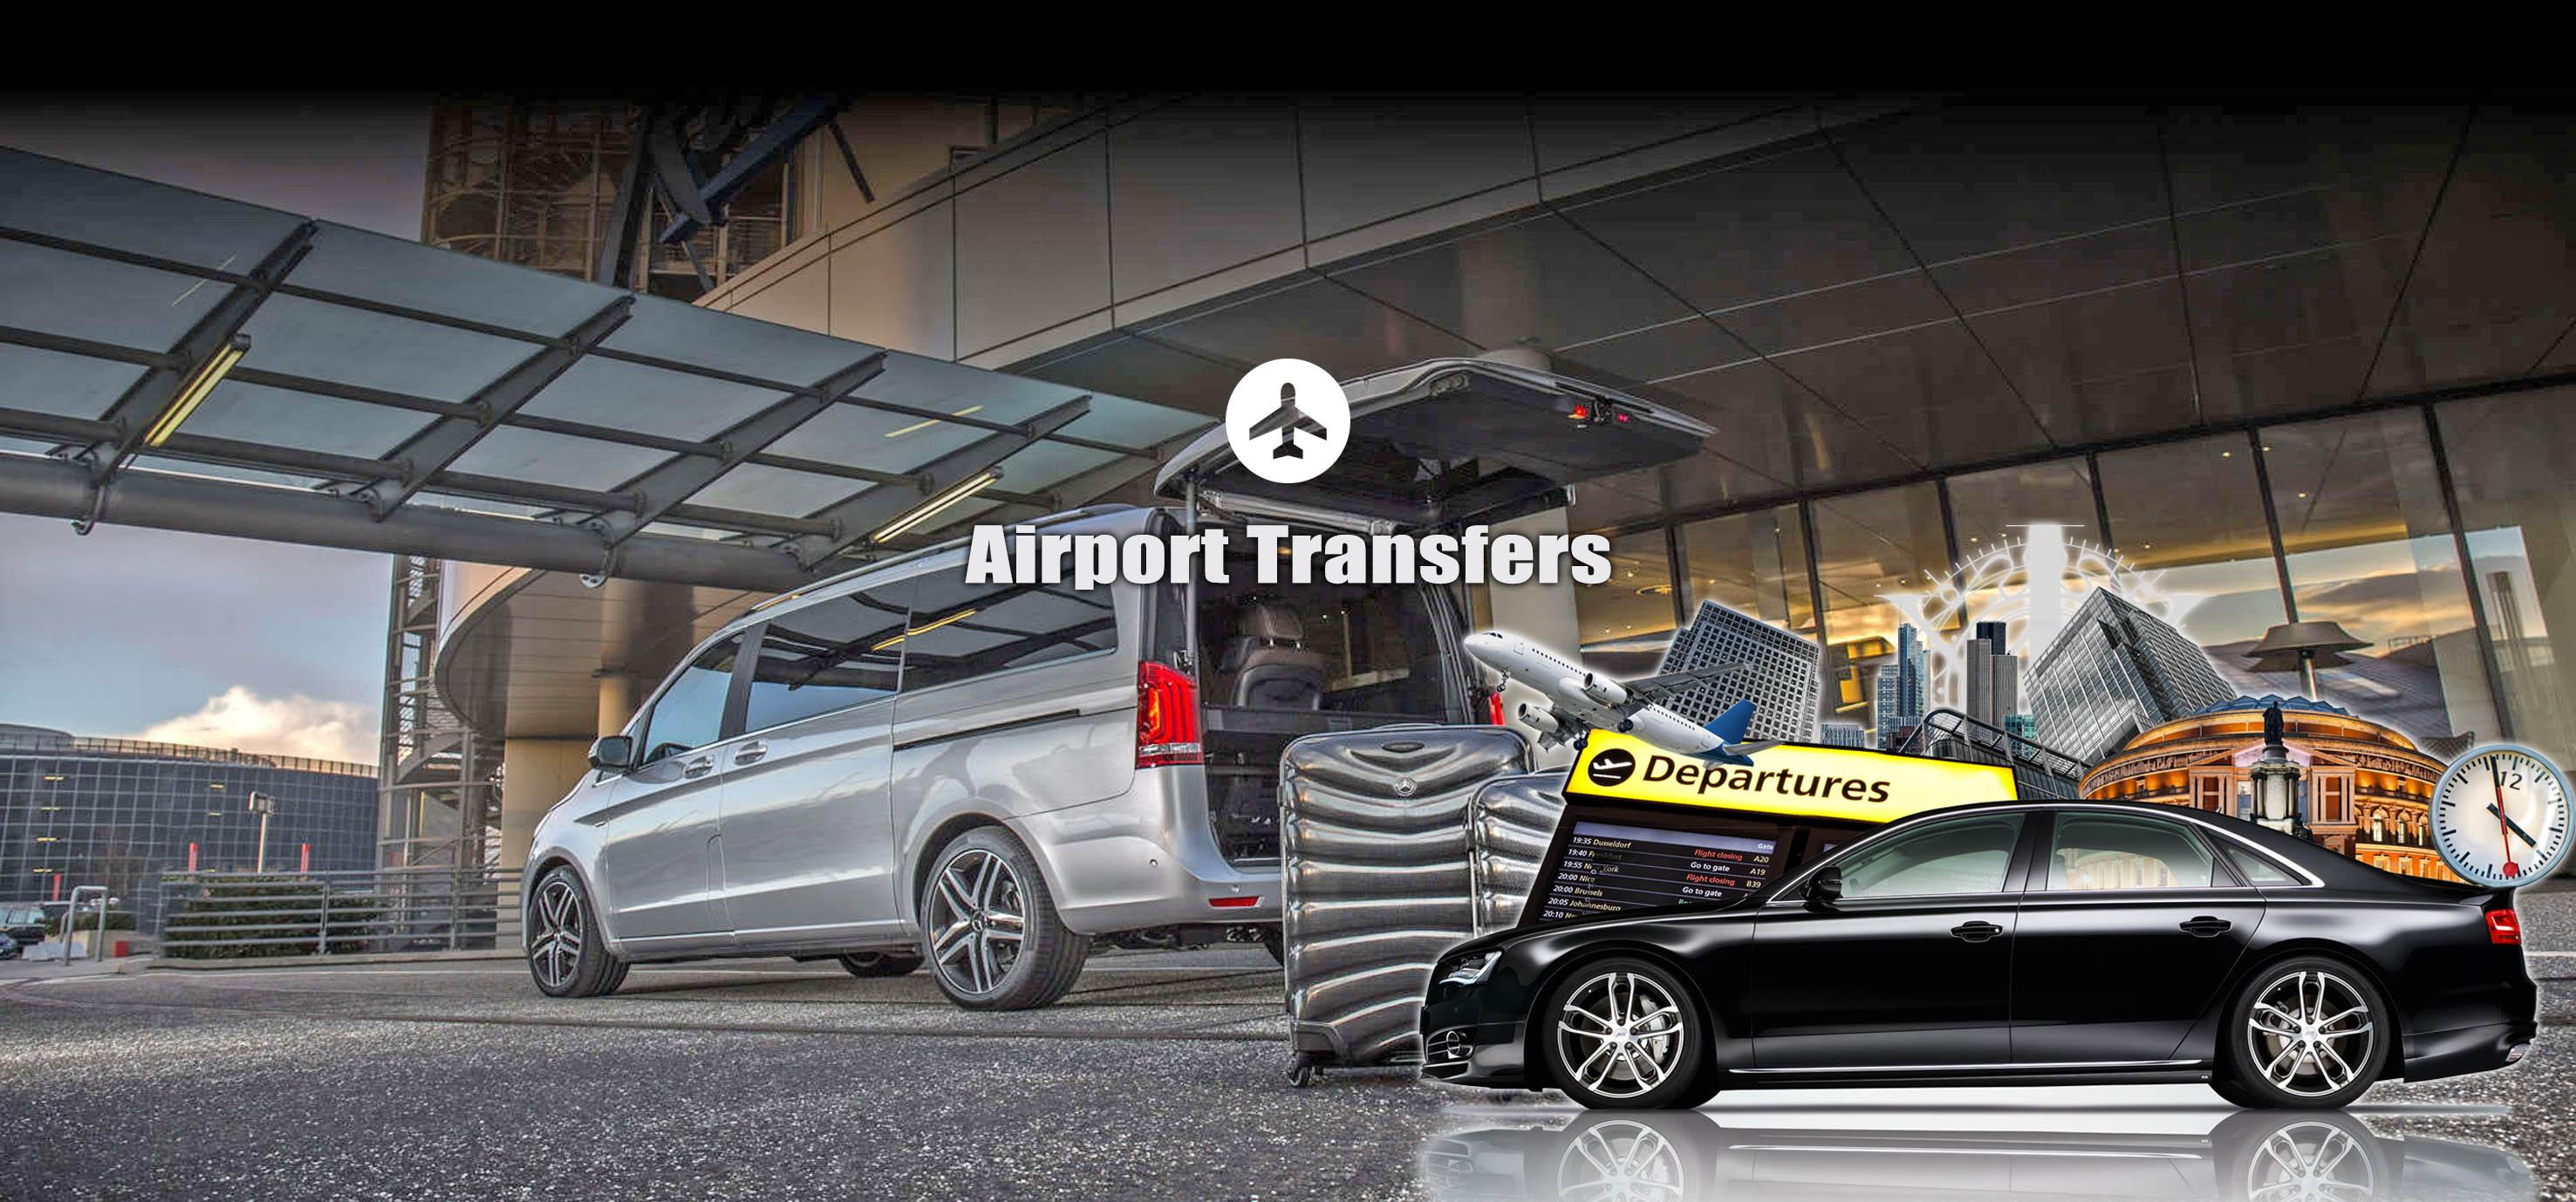 Korea Airport Transfers main